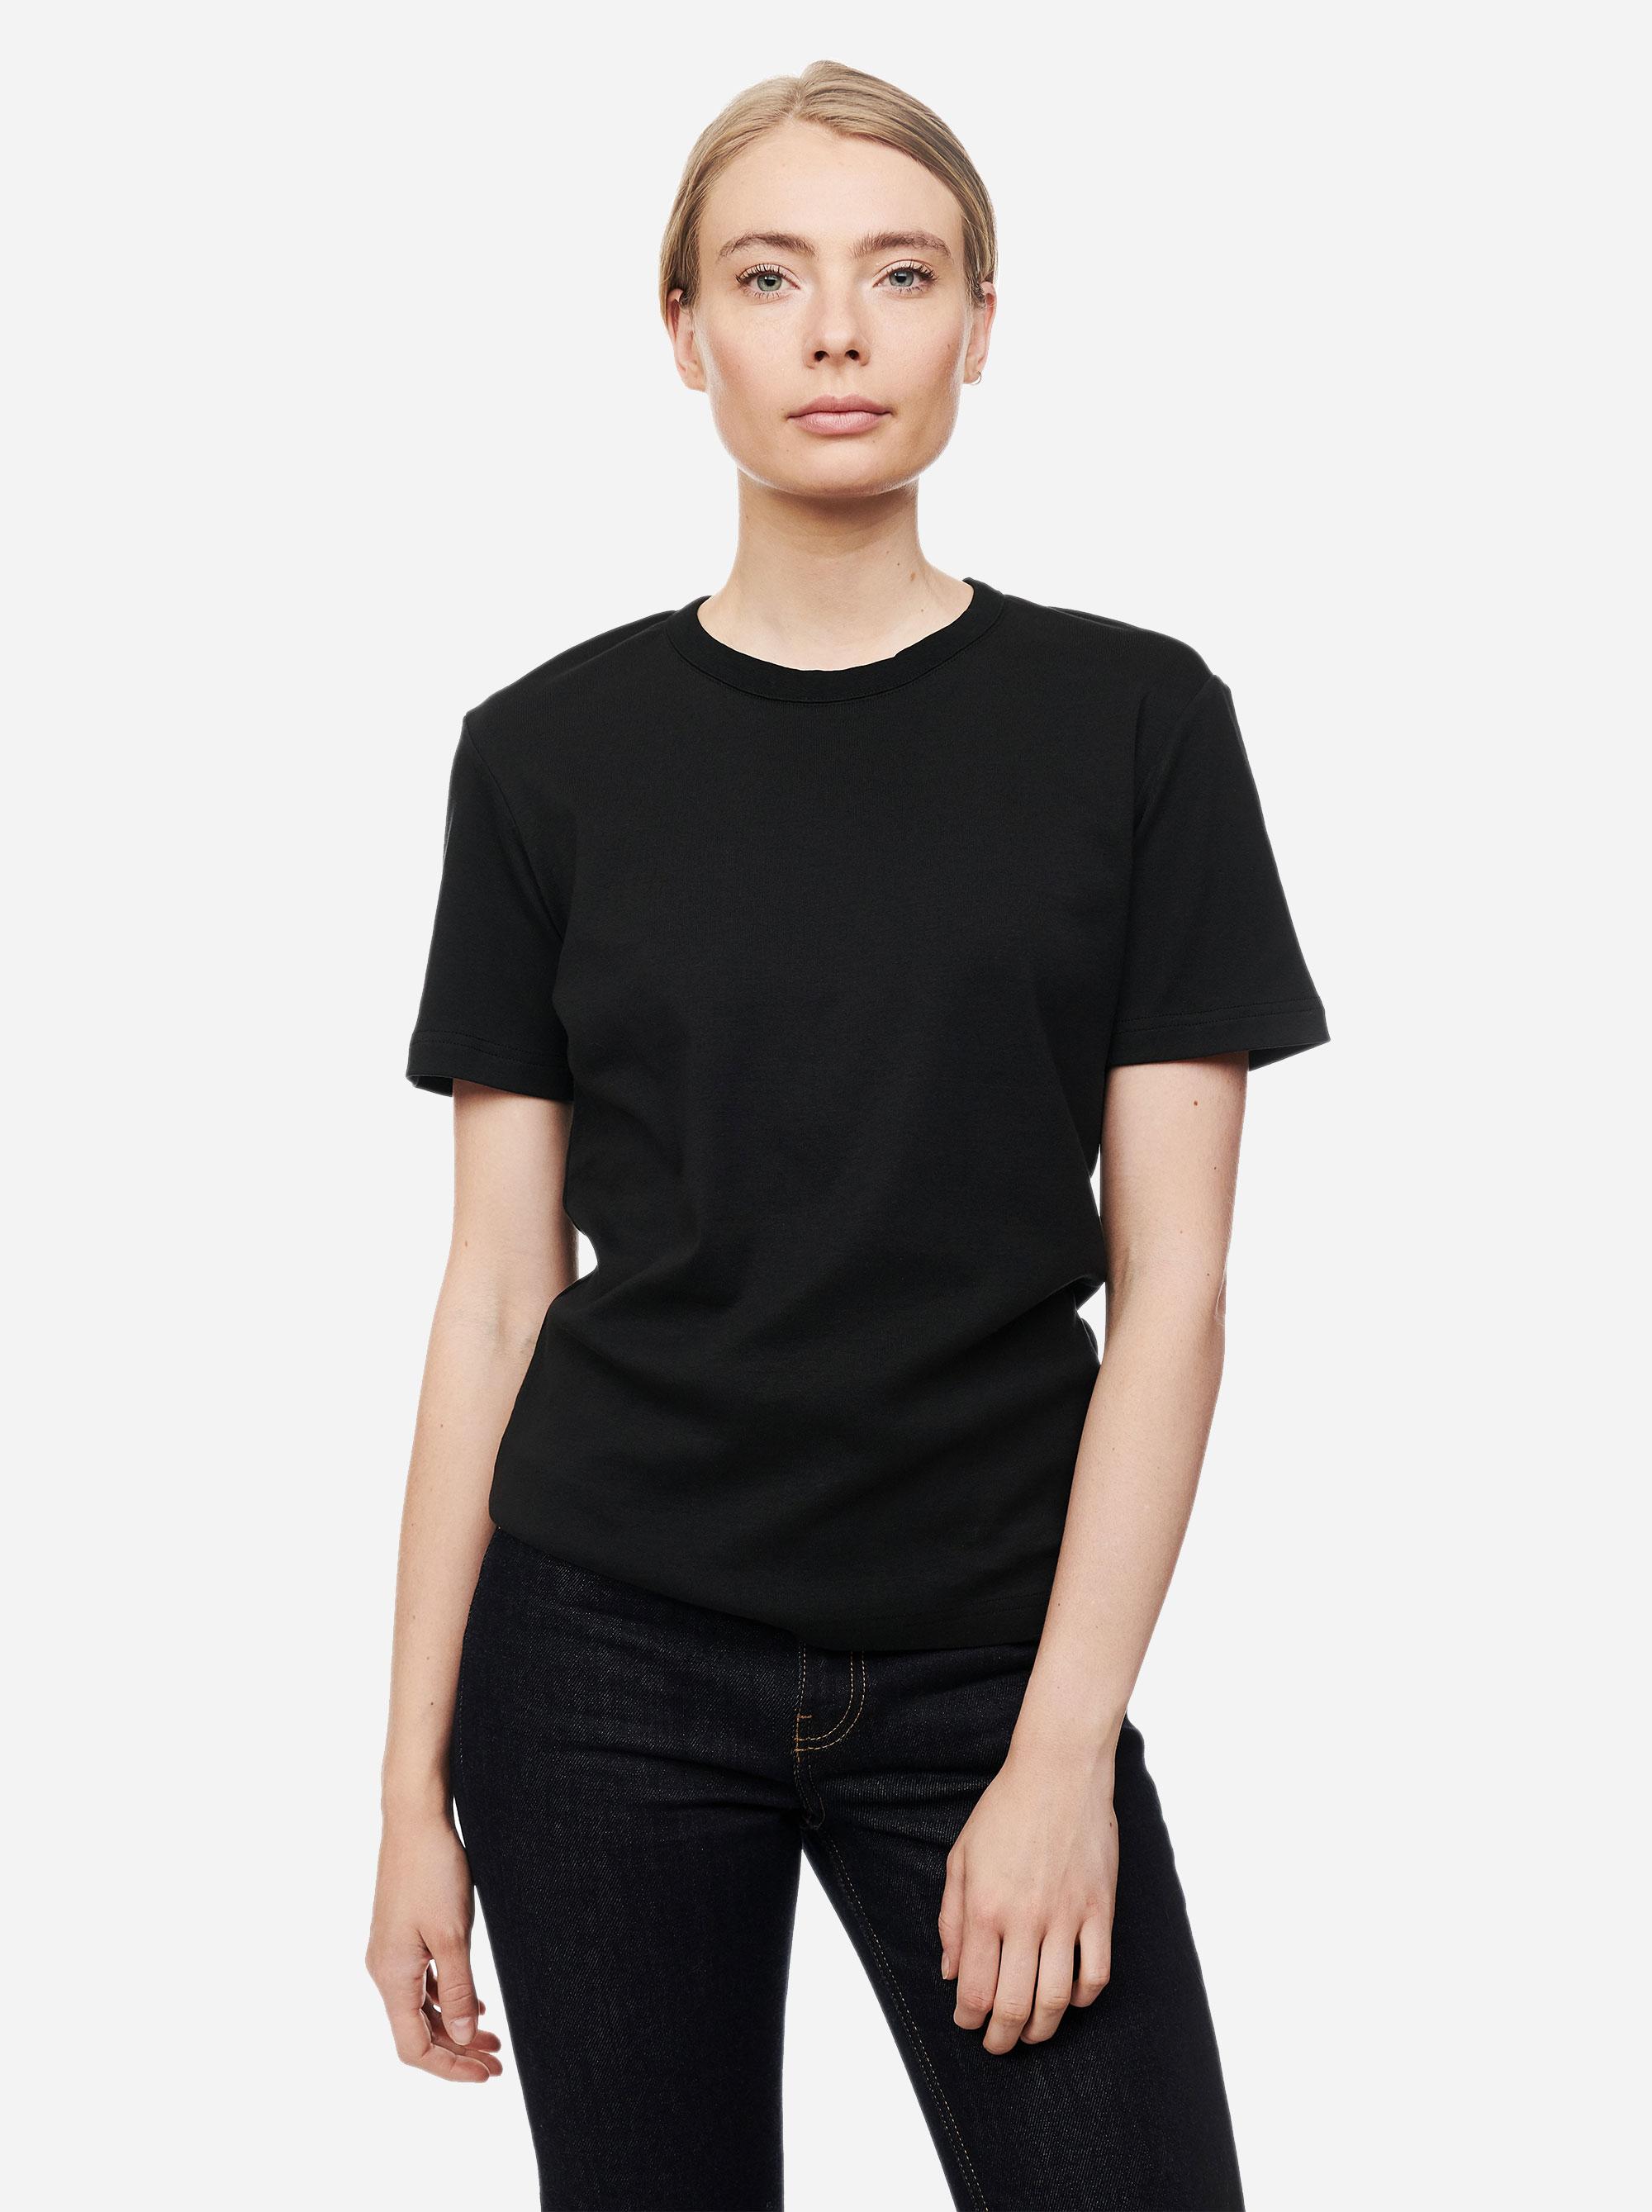 Teym - The T-Shirt - Women - Black1